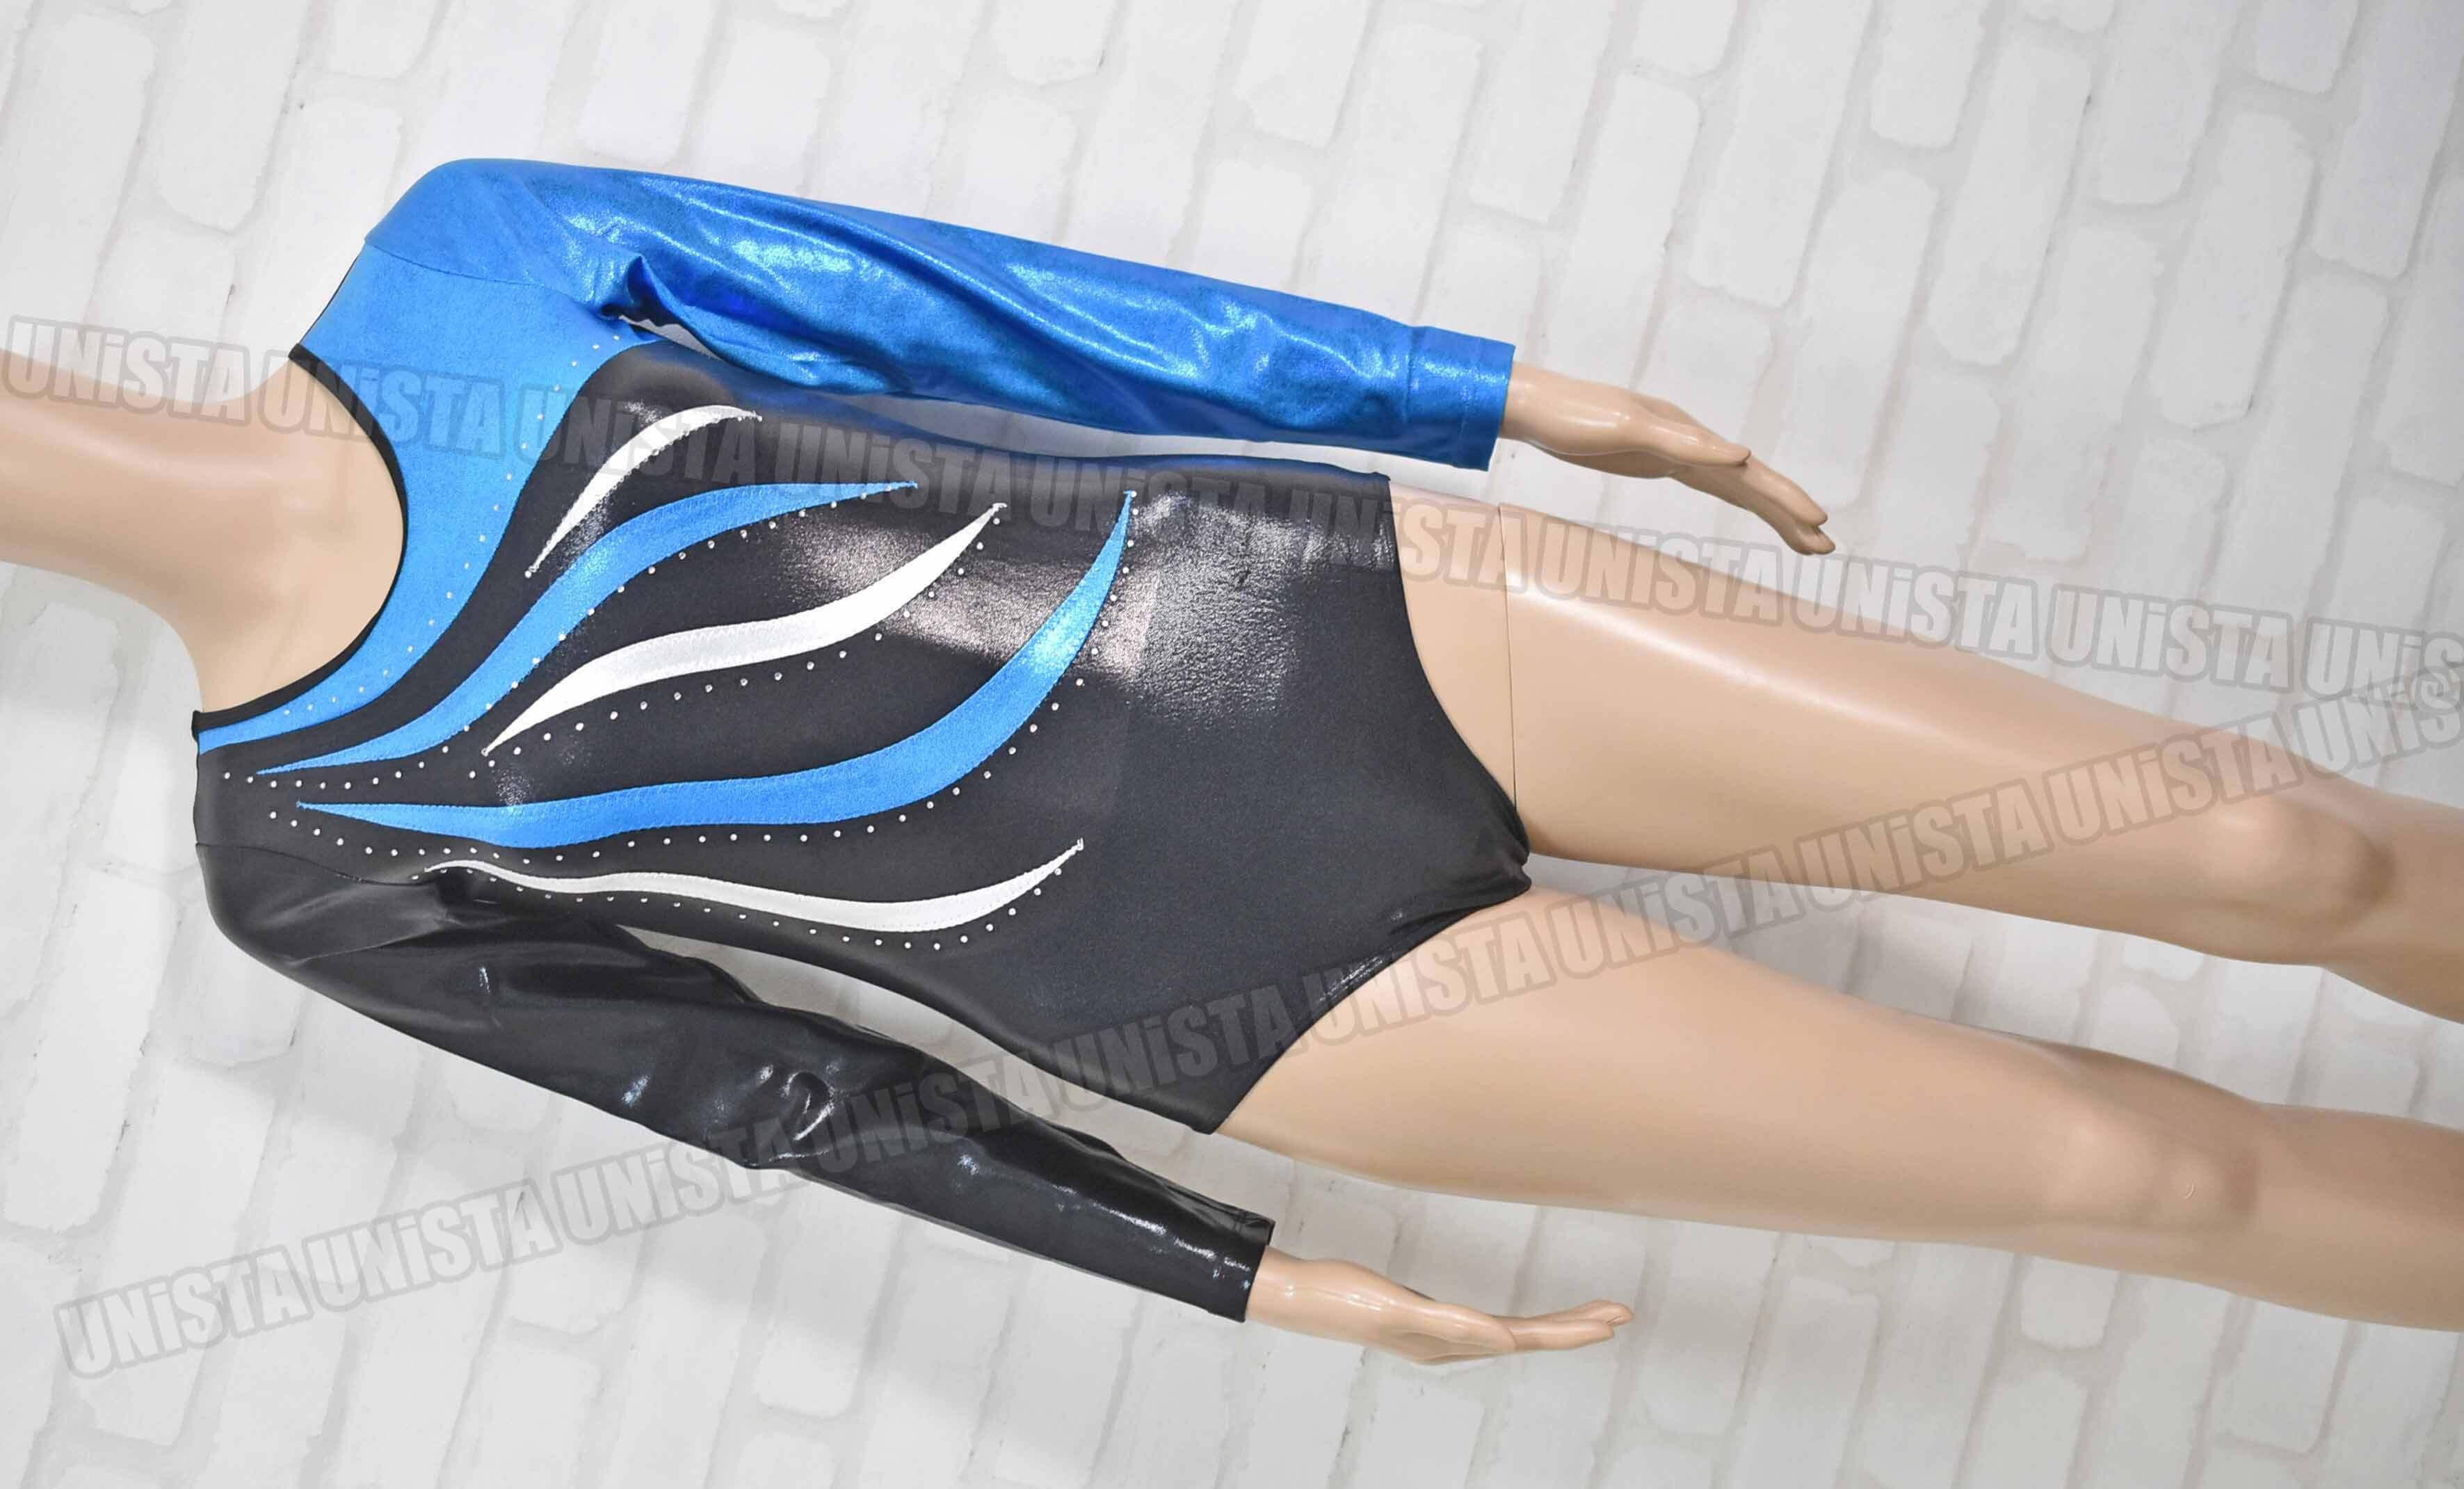 NON オリジナルデザイン 女子体操競技 ロングスリーブレオタード ブルー・ブラック